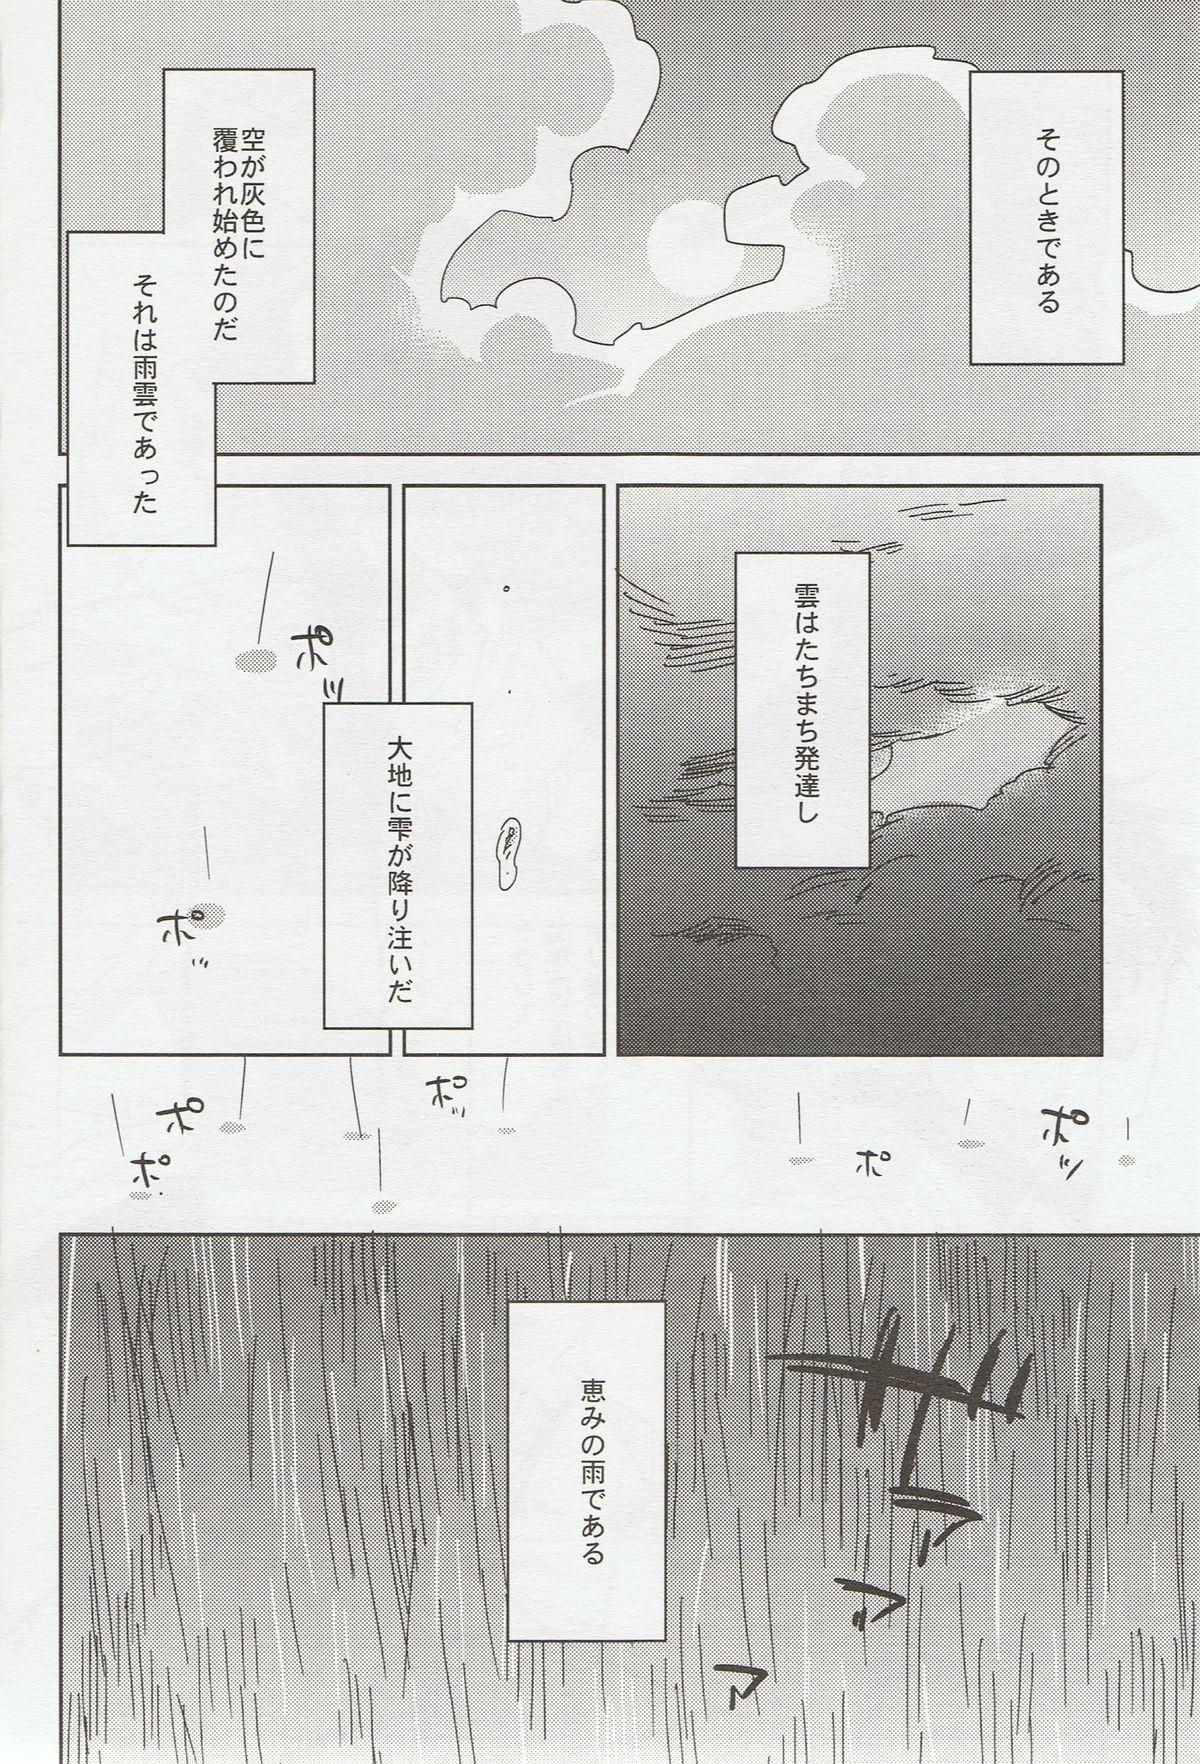 Sou da, Tottori Sakyuu Ikou. 18